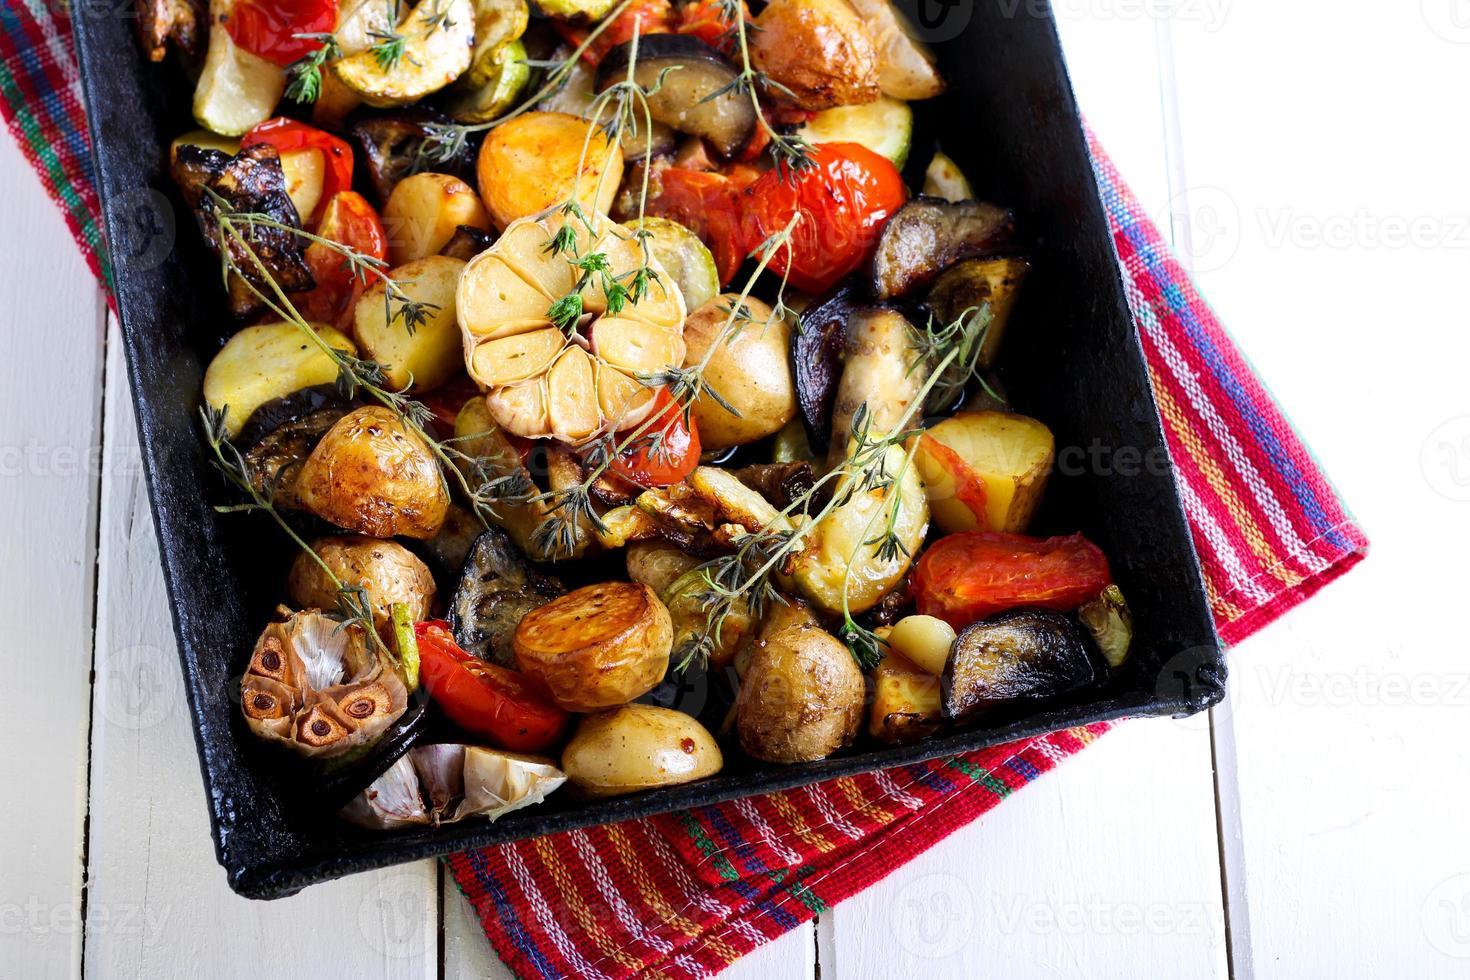 verduras al horno con romero foto